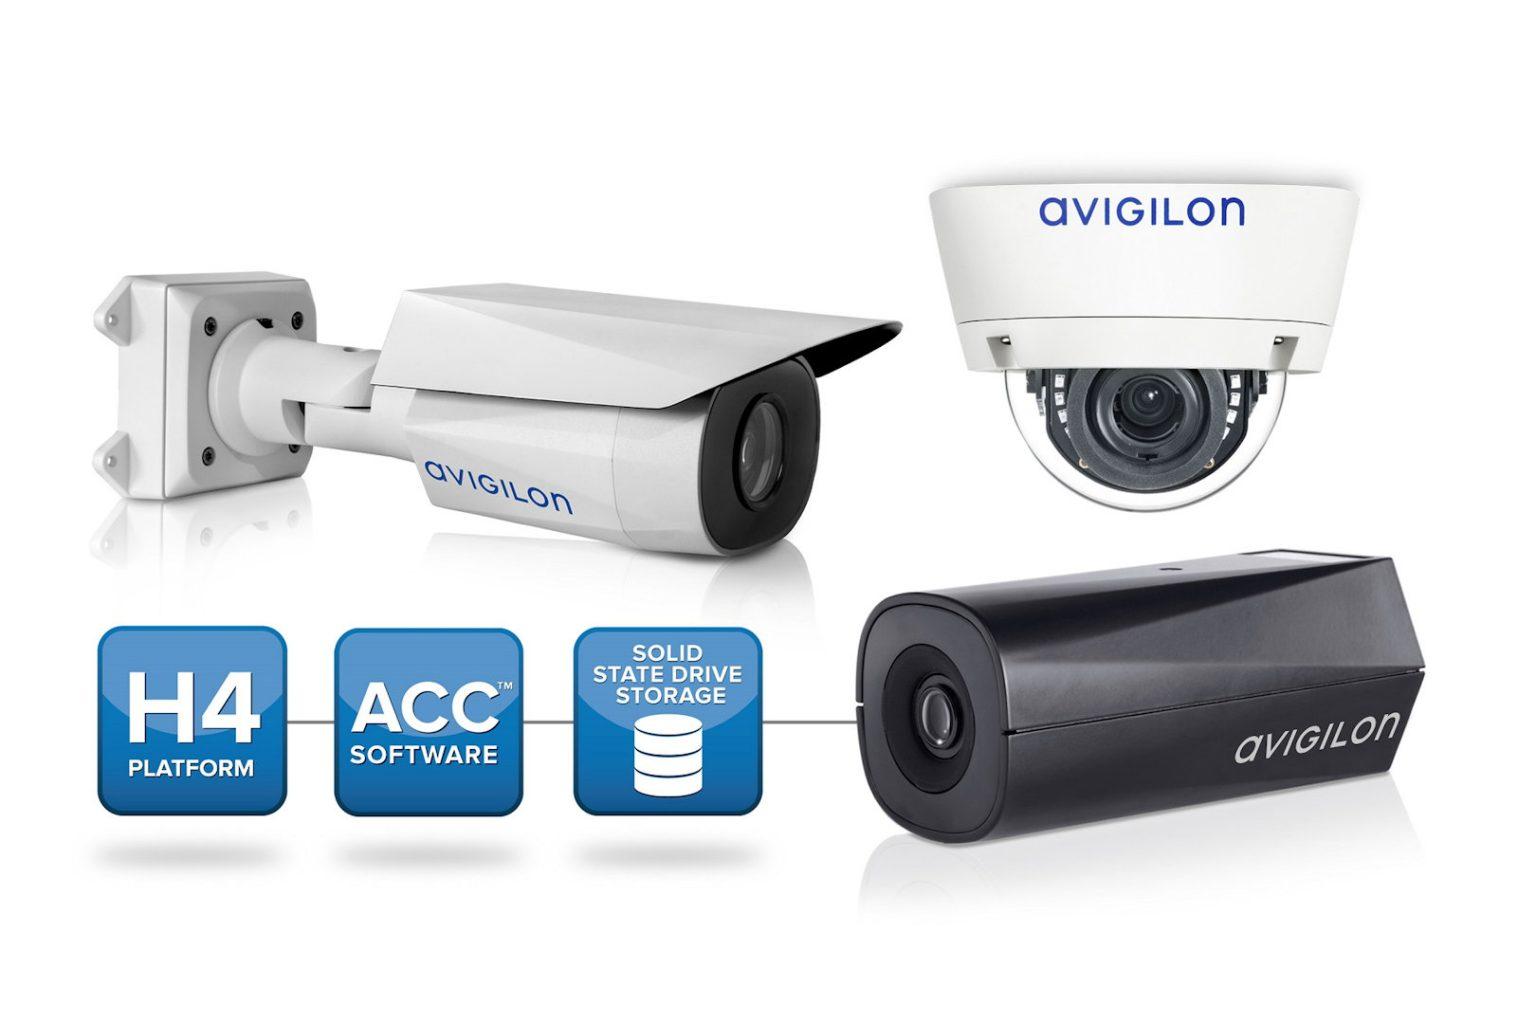 microngroup avigilon H4ES cctv network camera line up